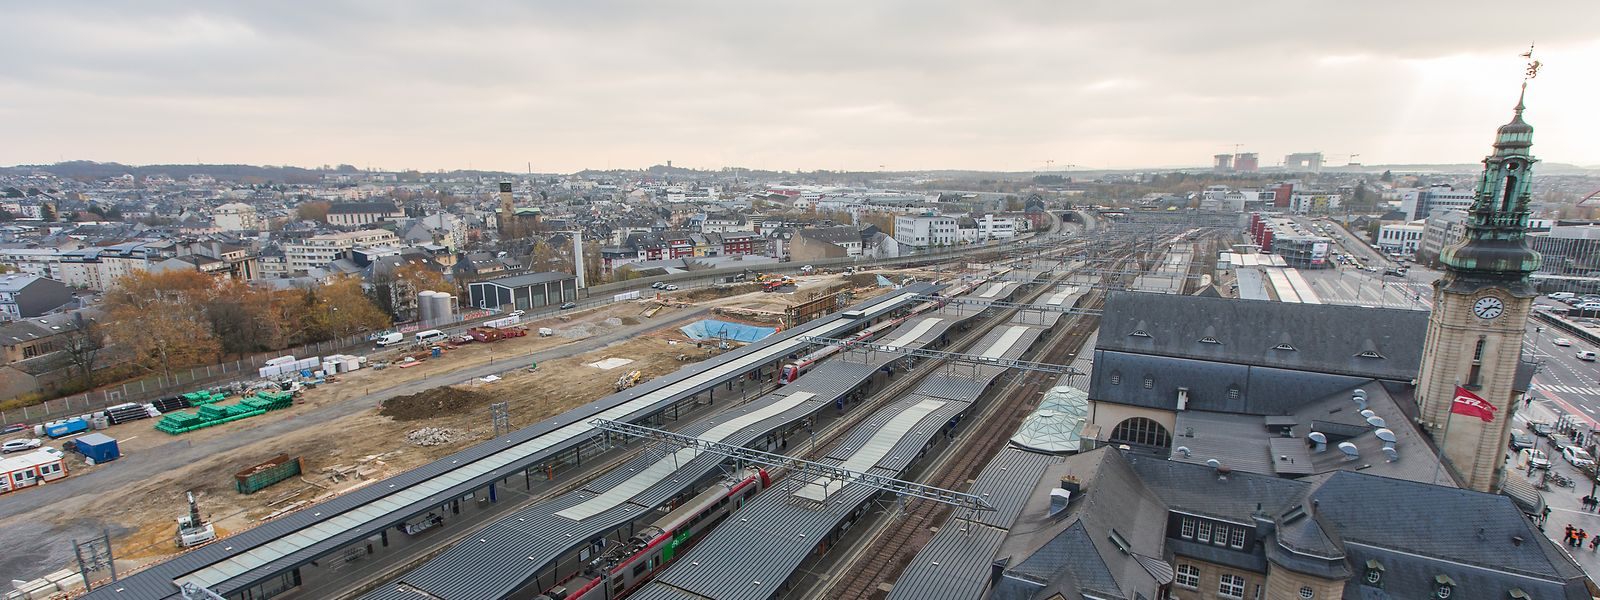 Ausbau Bahnhof Luxemburg.